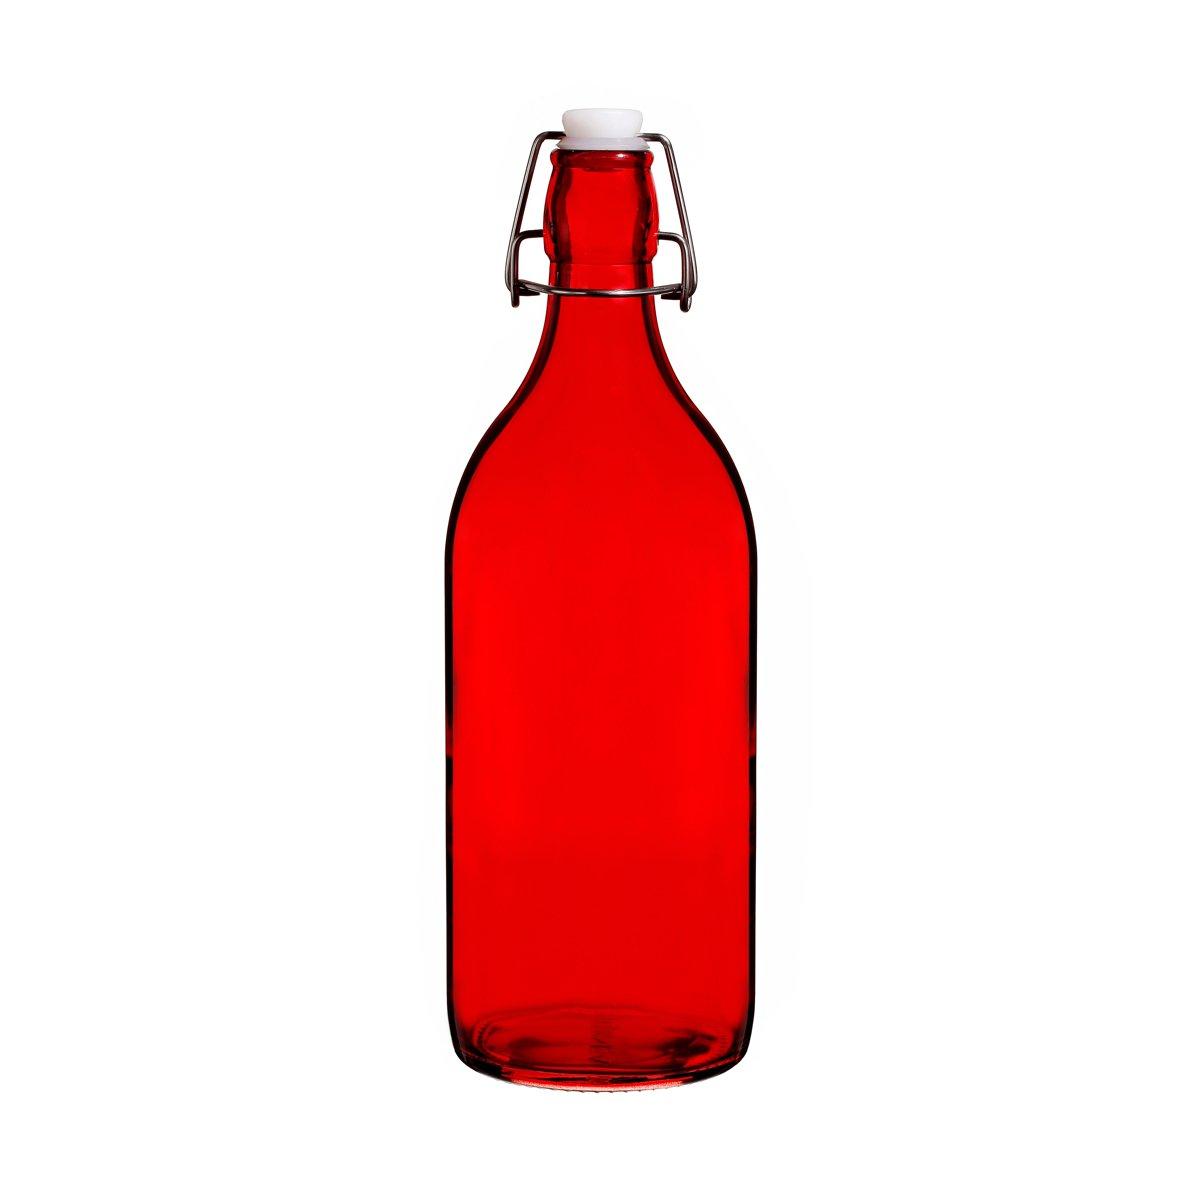 Colorful Reusable Glass Water Bottles With Swing Top Leakproof Cap, 1L / 34oz, Flowersea Glasss Water Bottle for Oil, Vinegar, Beverages, Beer, Water, Kombucha, Kefir, Soda (Red, Round)